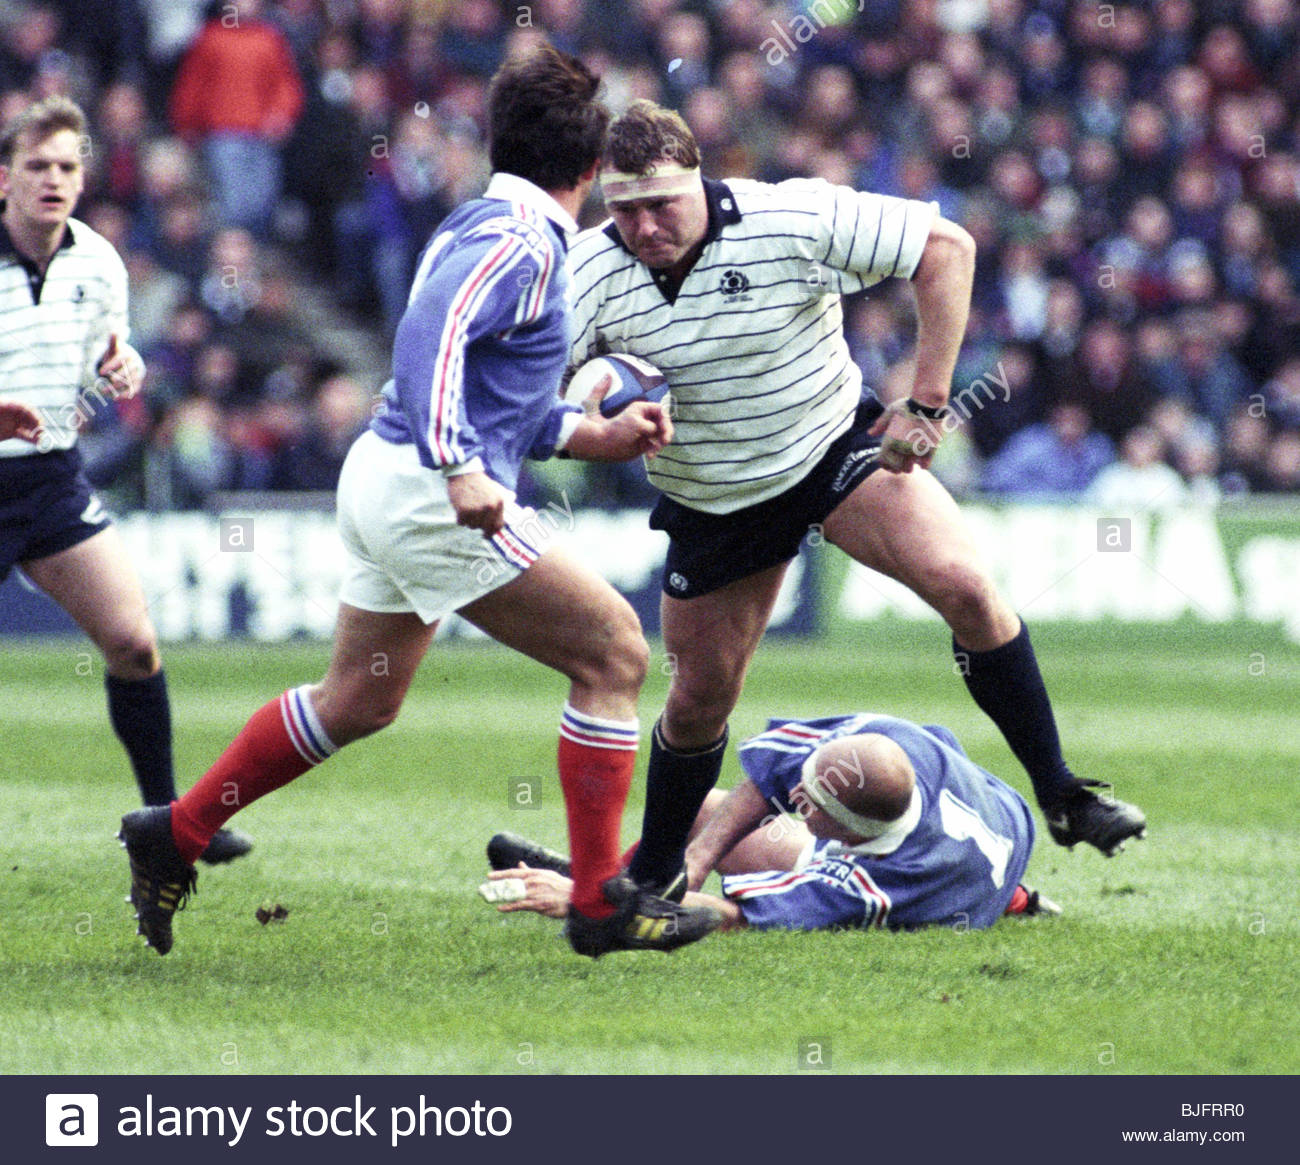 20/03/94 FIVE NATIONS CHAMPIONSHIP SCOTLAND V FRANCE (12-20) MURRAYFIELD - EDINBURGH Scotland's Peter Walton - Stock Image